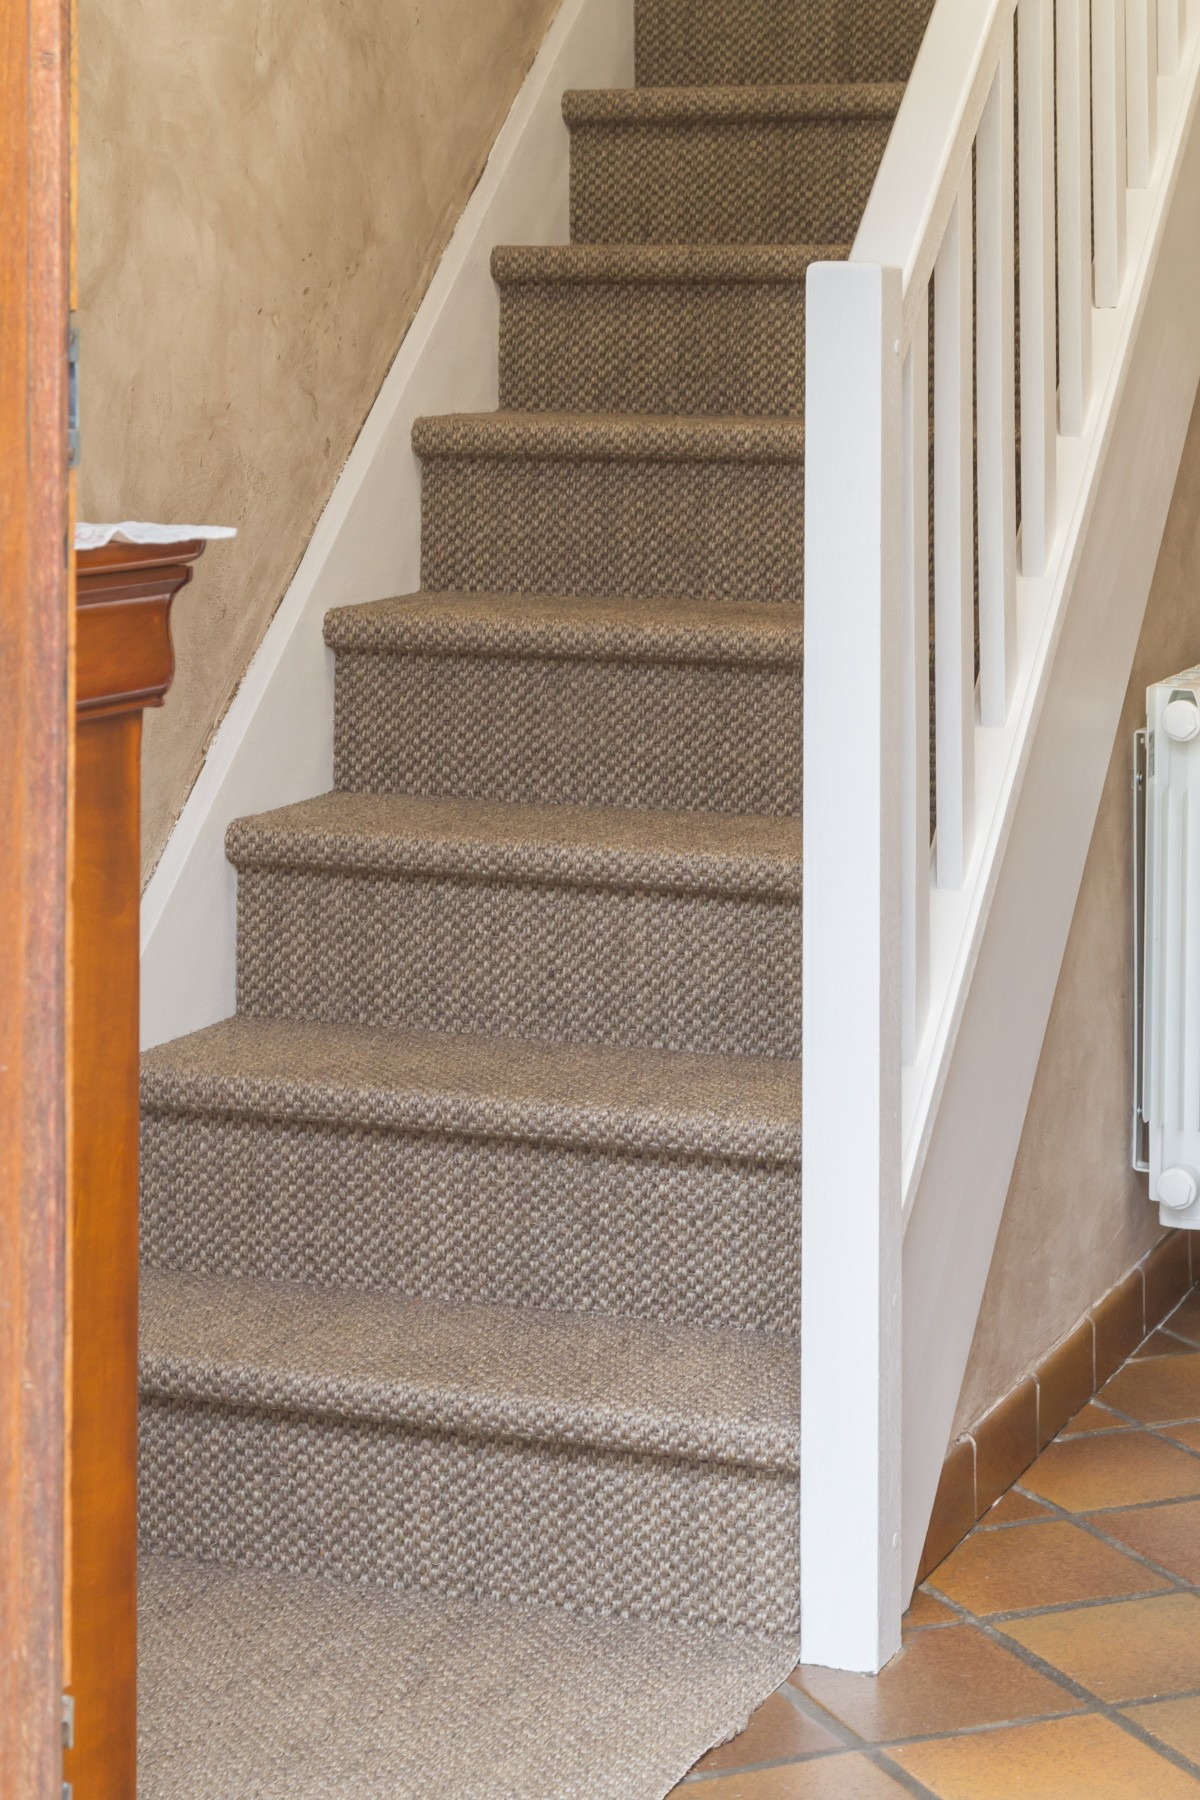 renovation d escalier en sisal saint